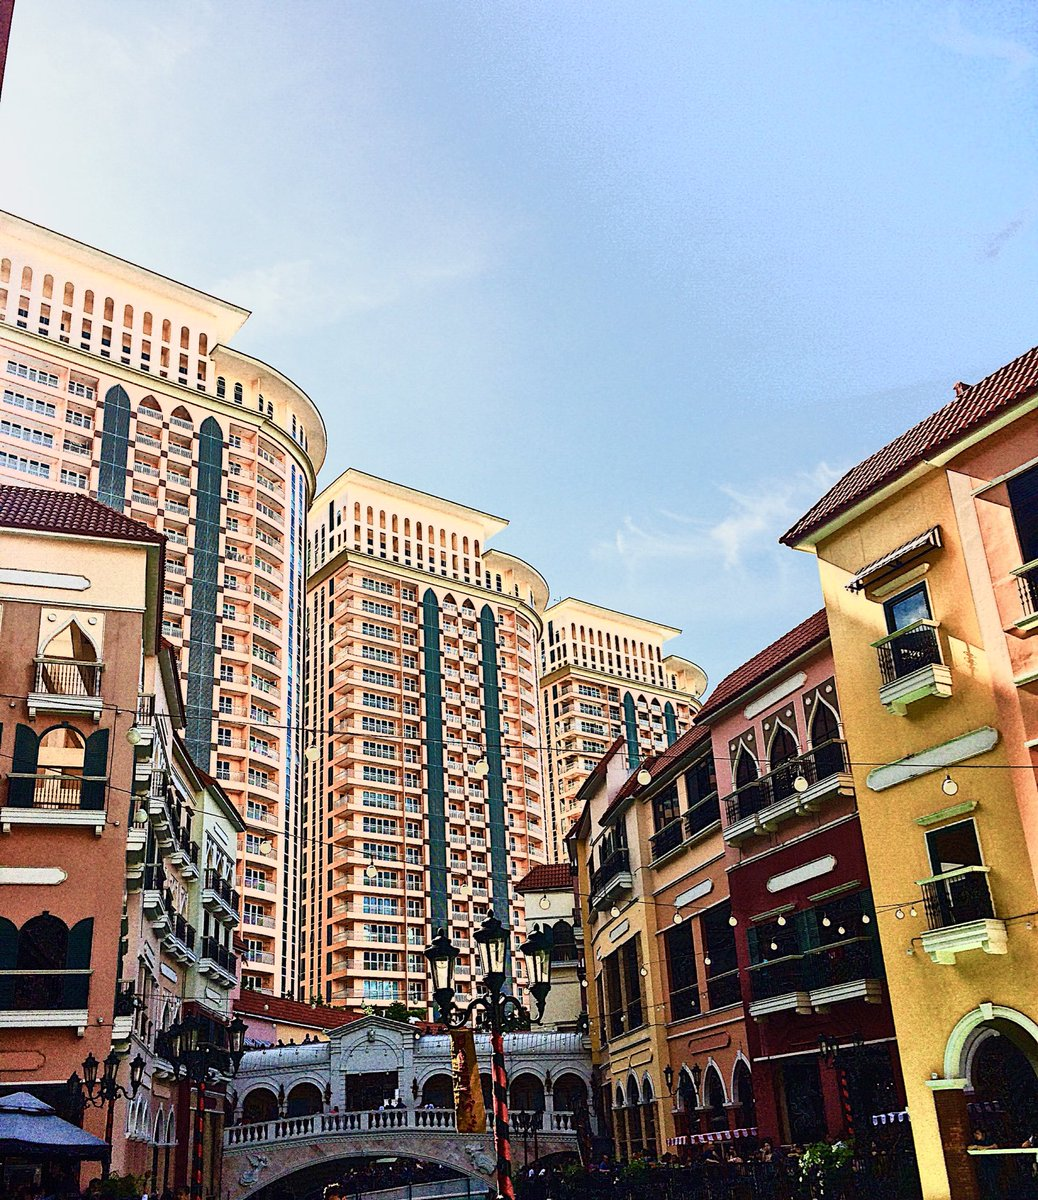 A Venice inspired place! #bgc #philippines #philippines #vsco #vscocam #vscoph #travel #venice #malls #imtheauditor #traveler #citylifepic.twitter.com/hGECQWQptx